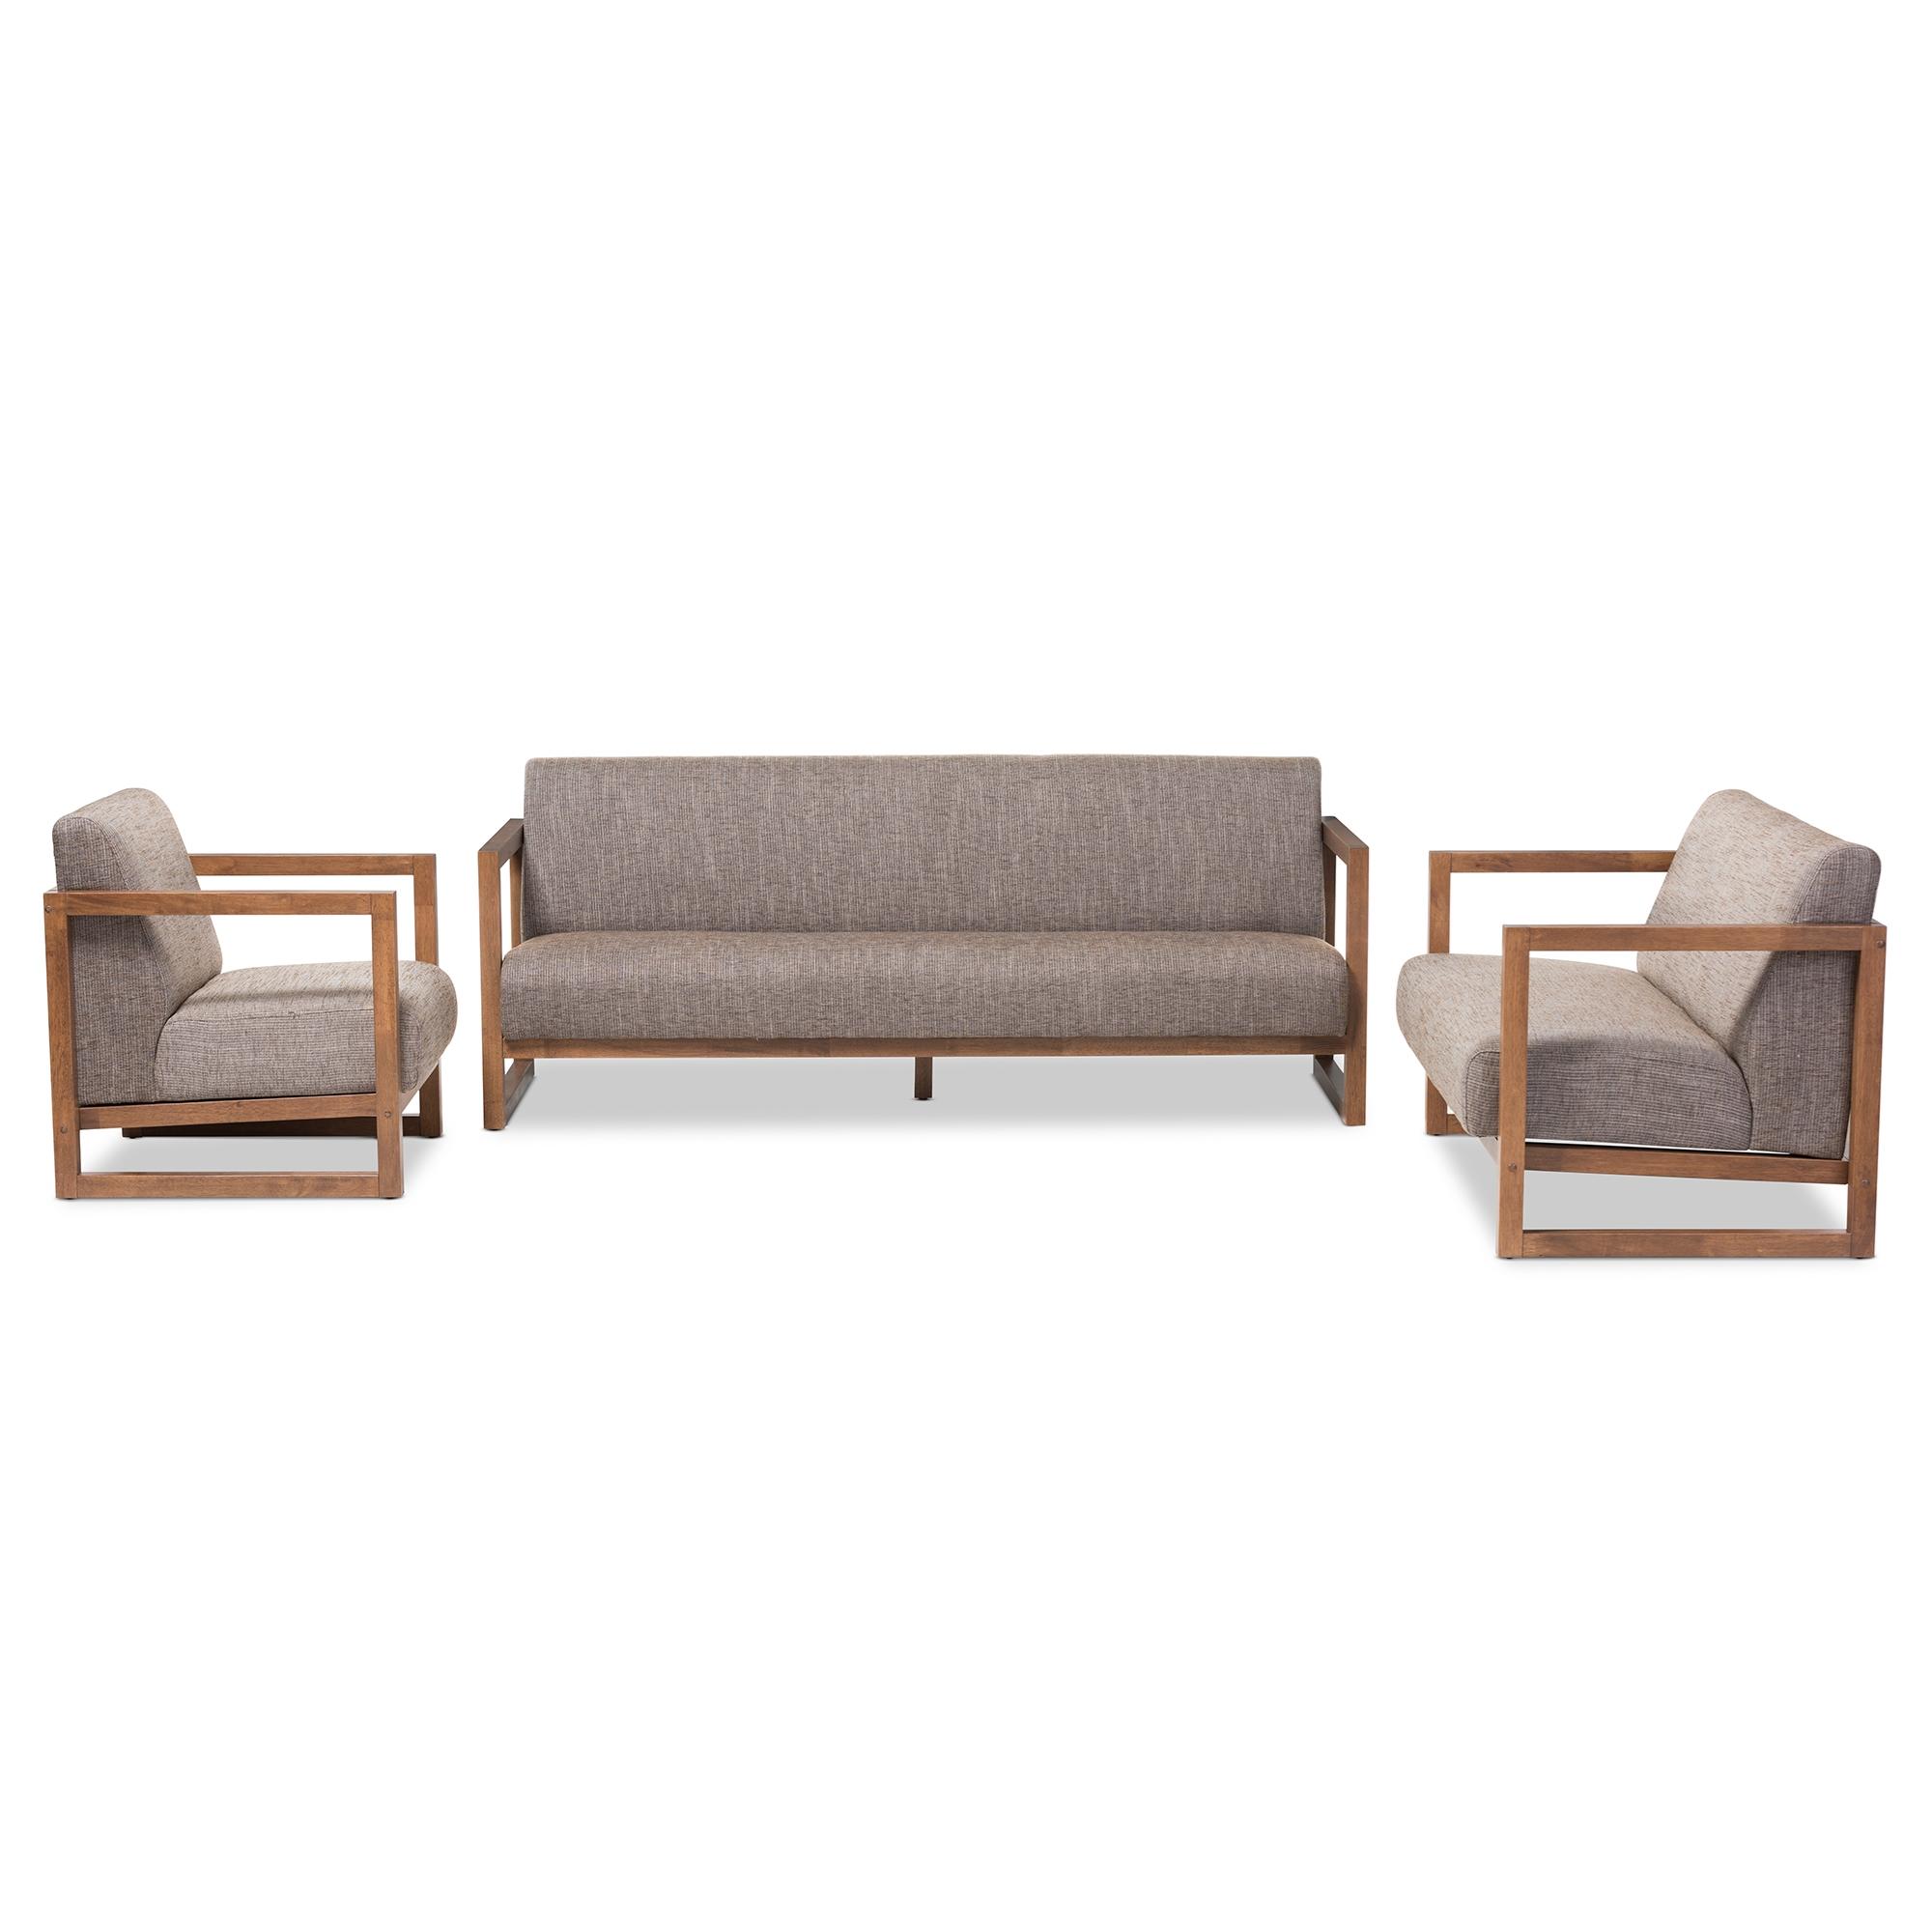 baxton studio valencia midcentury modern walnut wood finished gravel fabric upholstered 3piece living room set